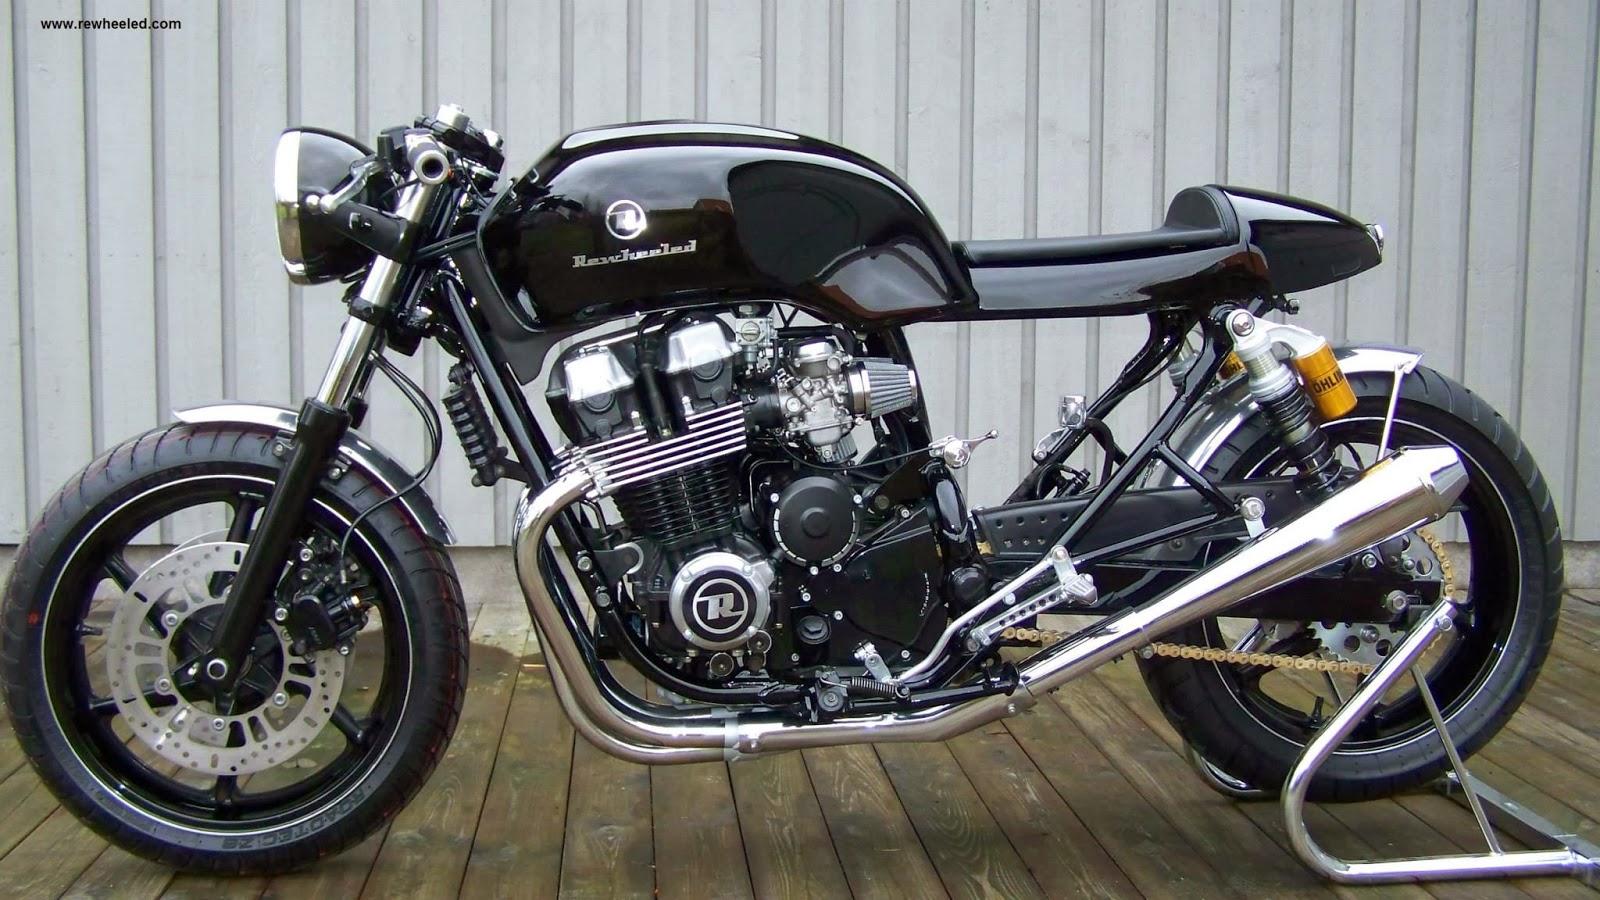 motogp honda cb 750 seven fifty caf racer by re cycles. Black Bedroom Furniture Sets. Home Design Ideas